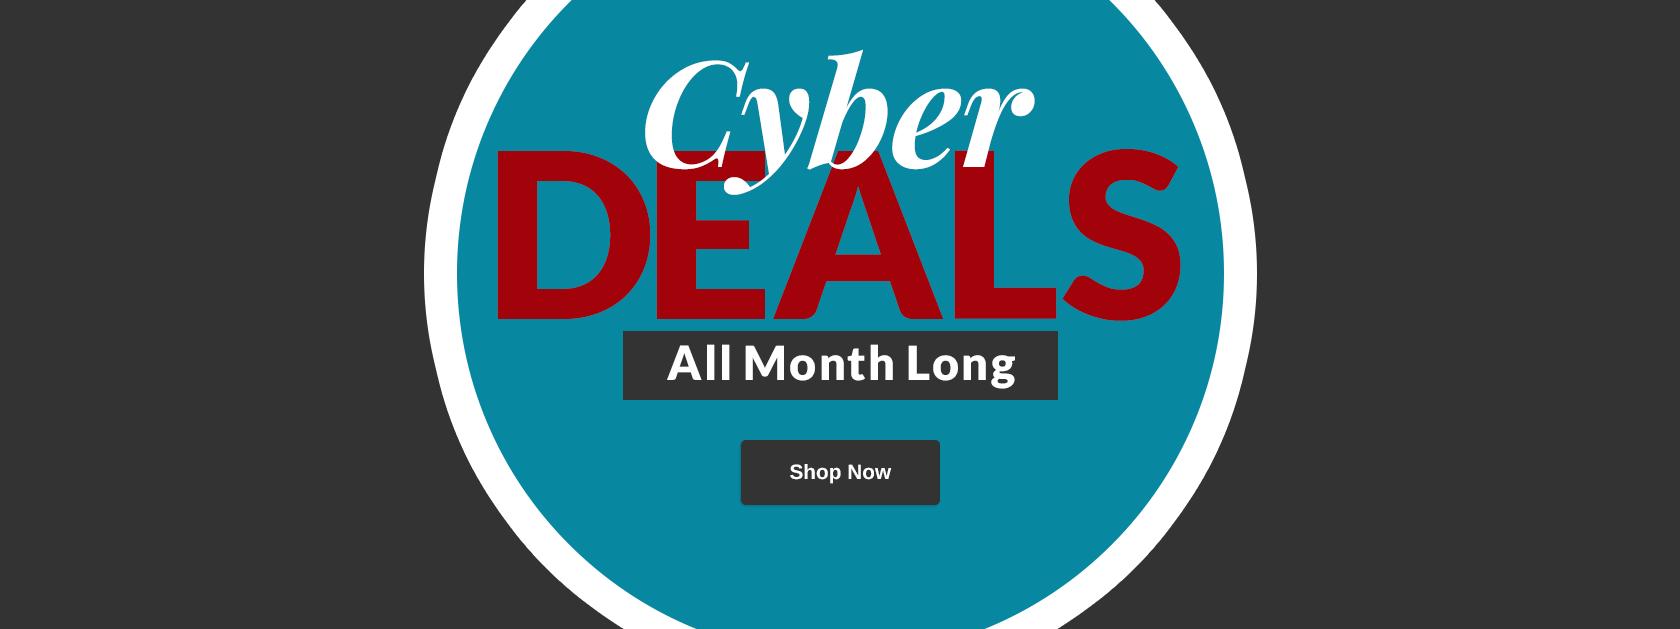 Cyber Deals - All Month Long!